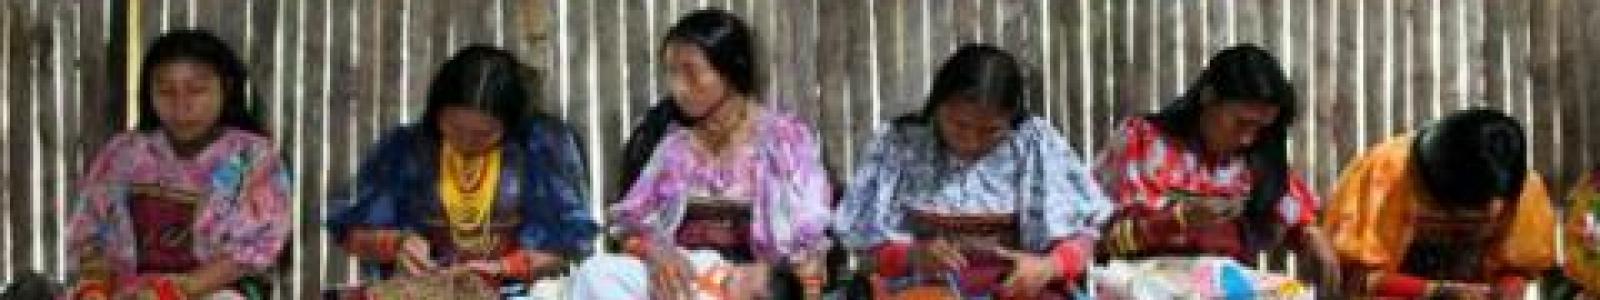 Colombia's ethnic groups